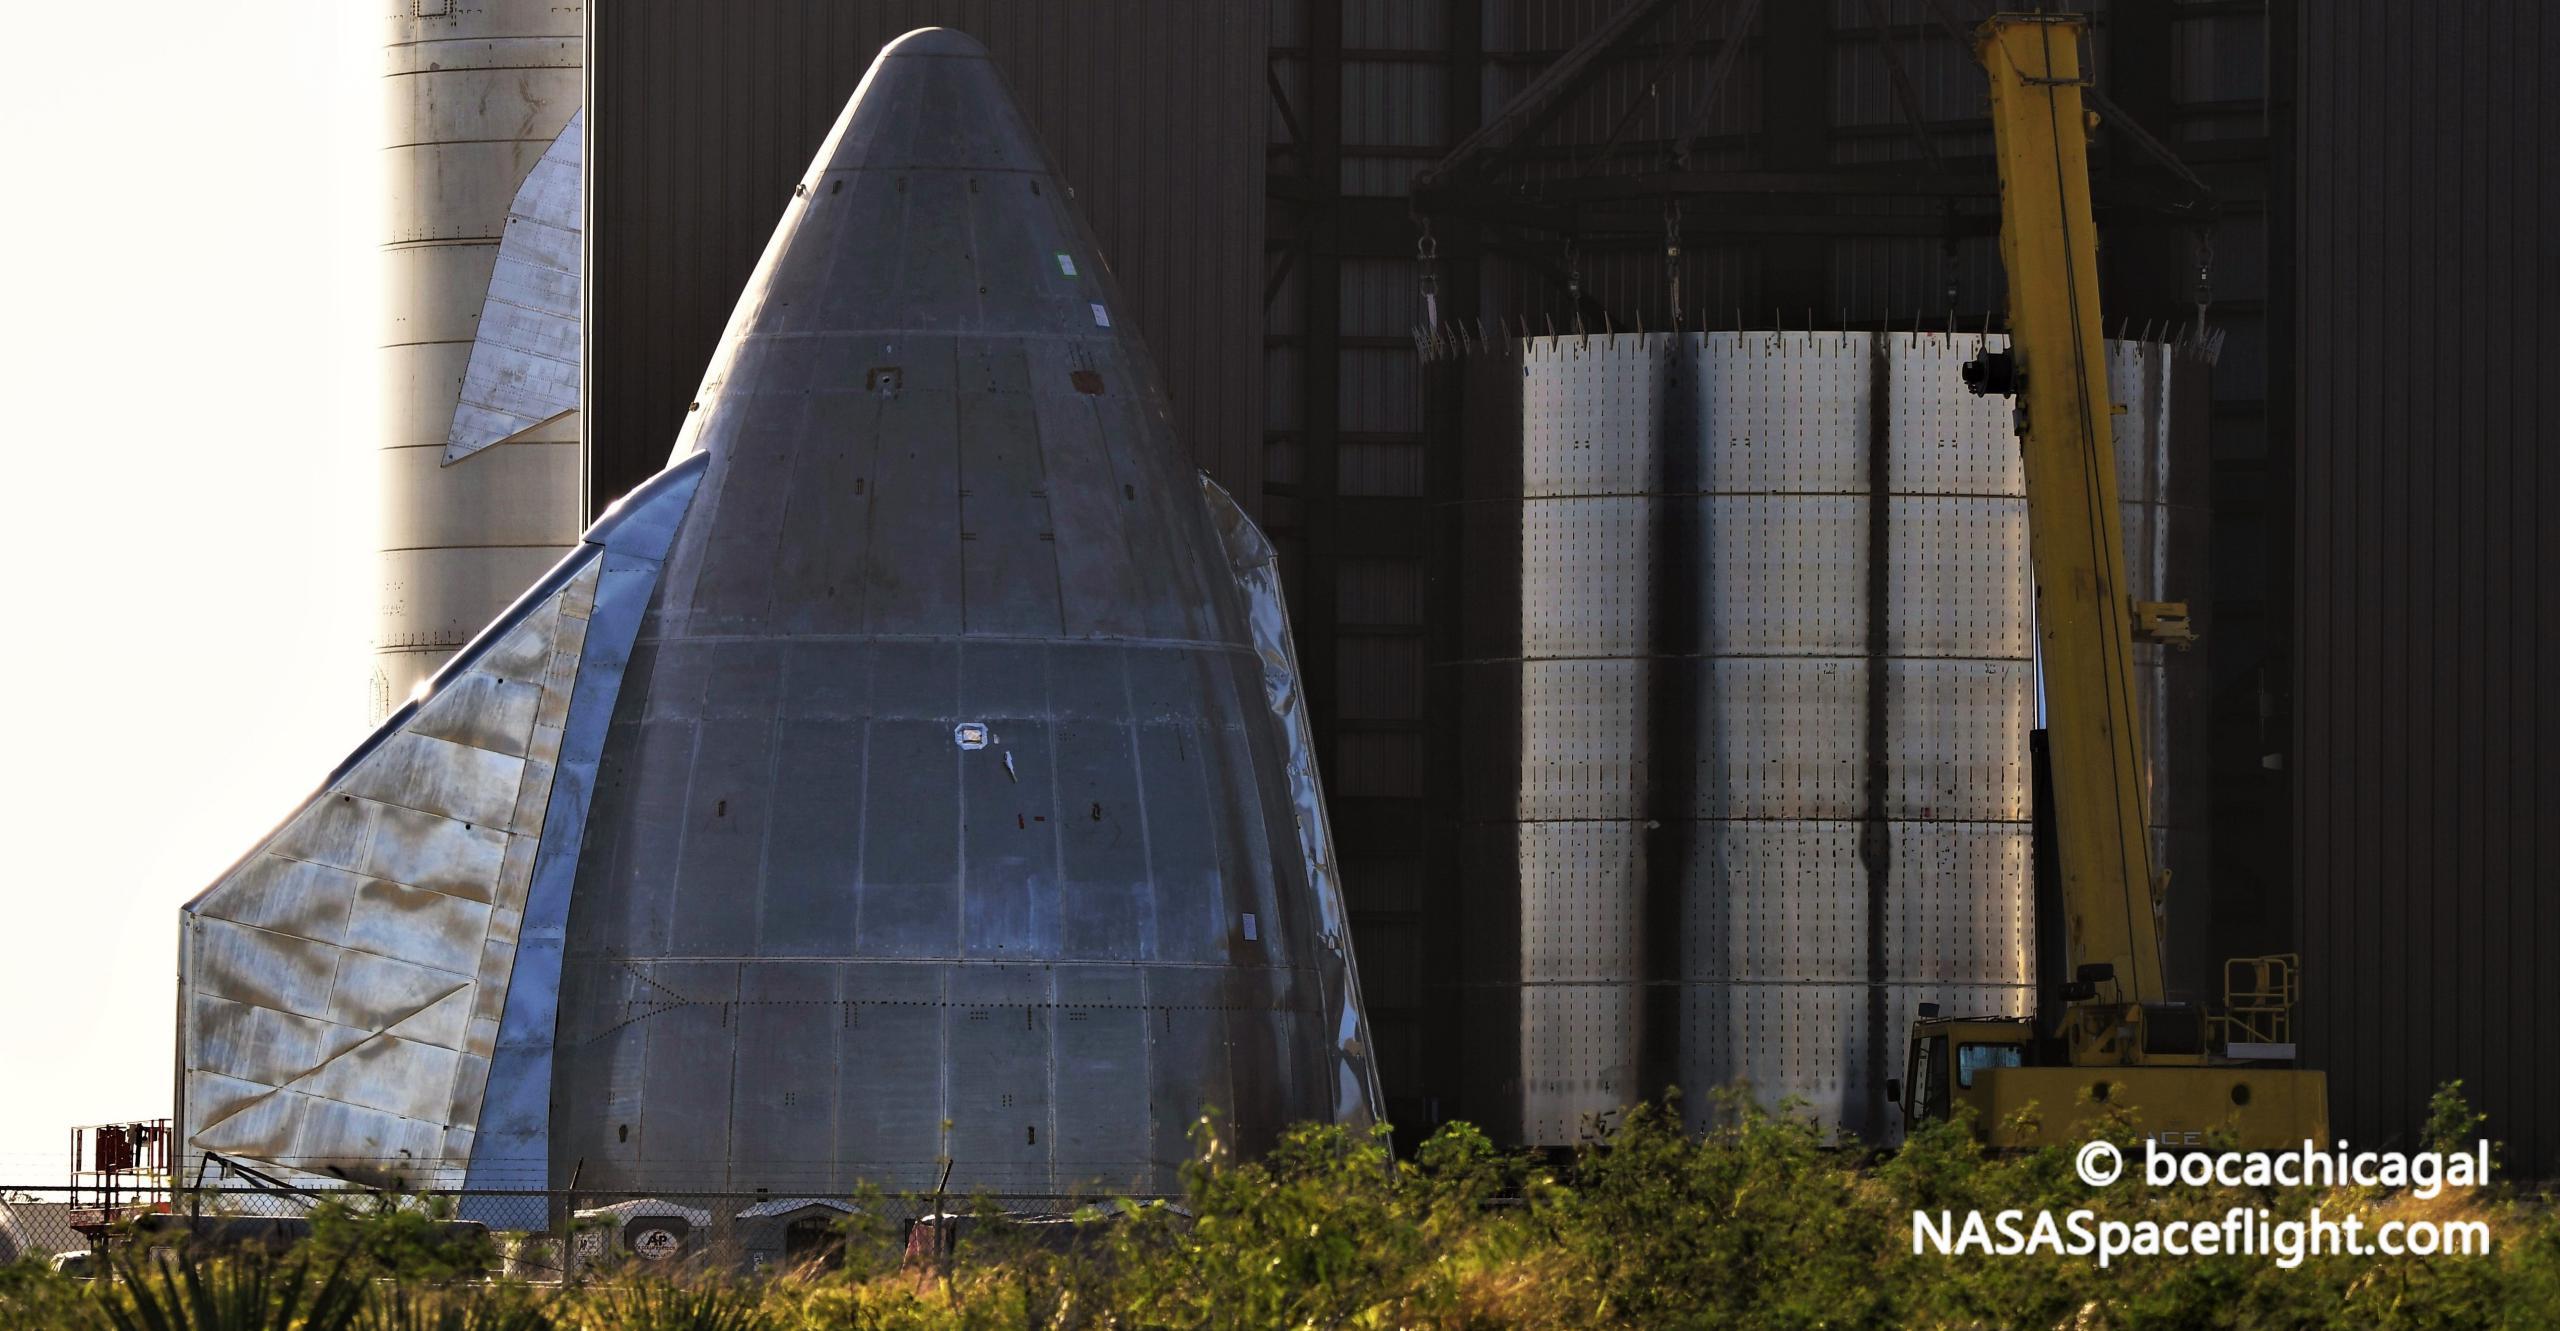 Starship Boca Chica 112020 (NASASpaceflight – bocachicagal) SN9 nosecone stack prep 5 crop (c)